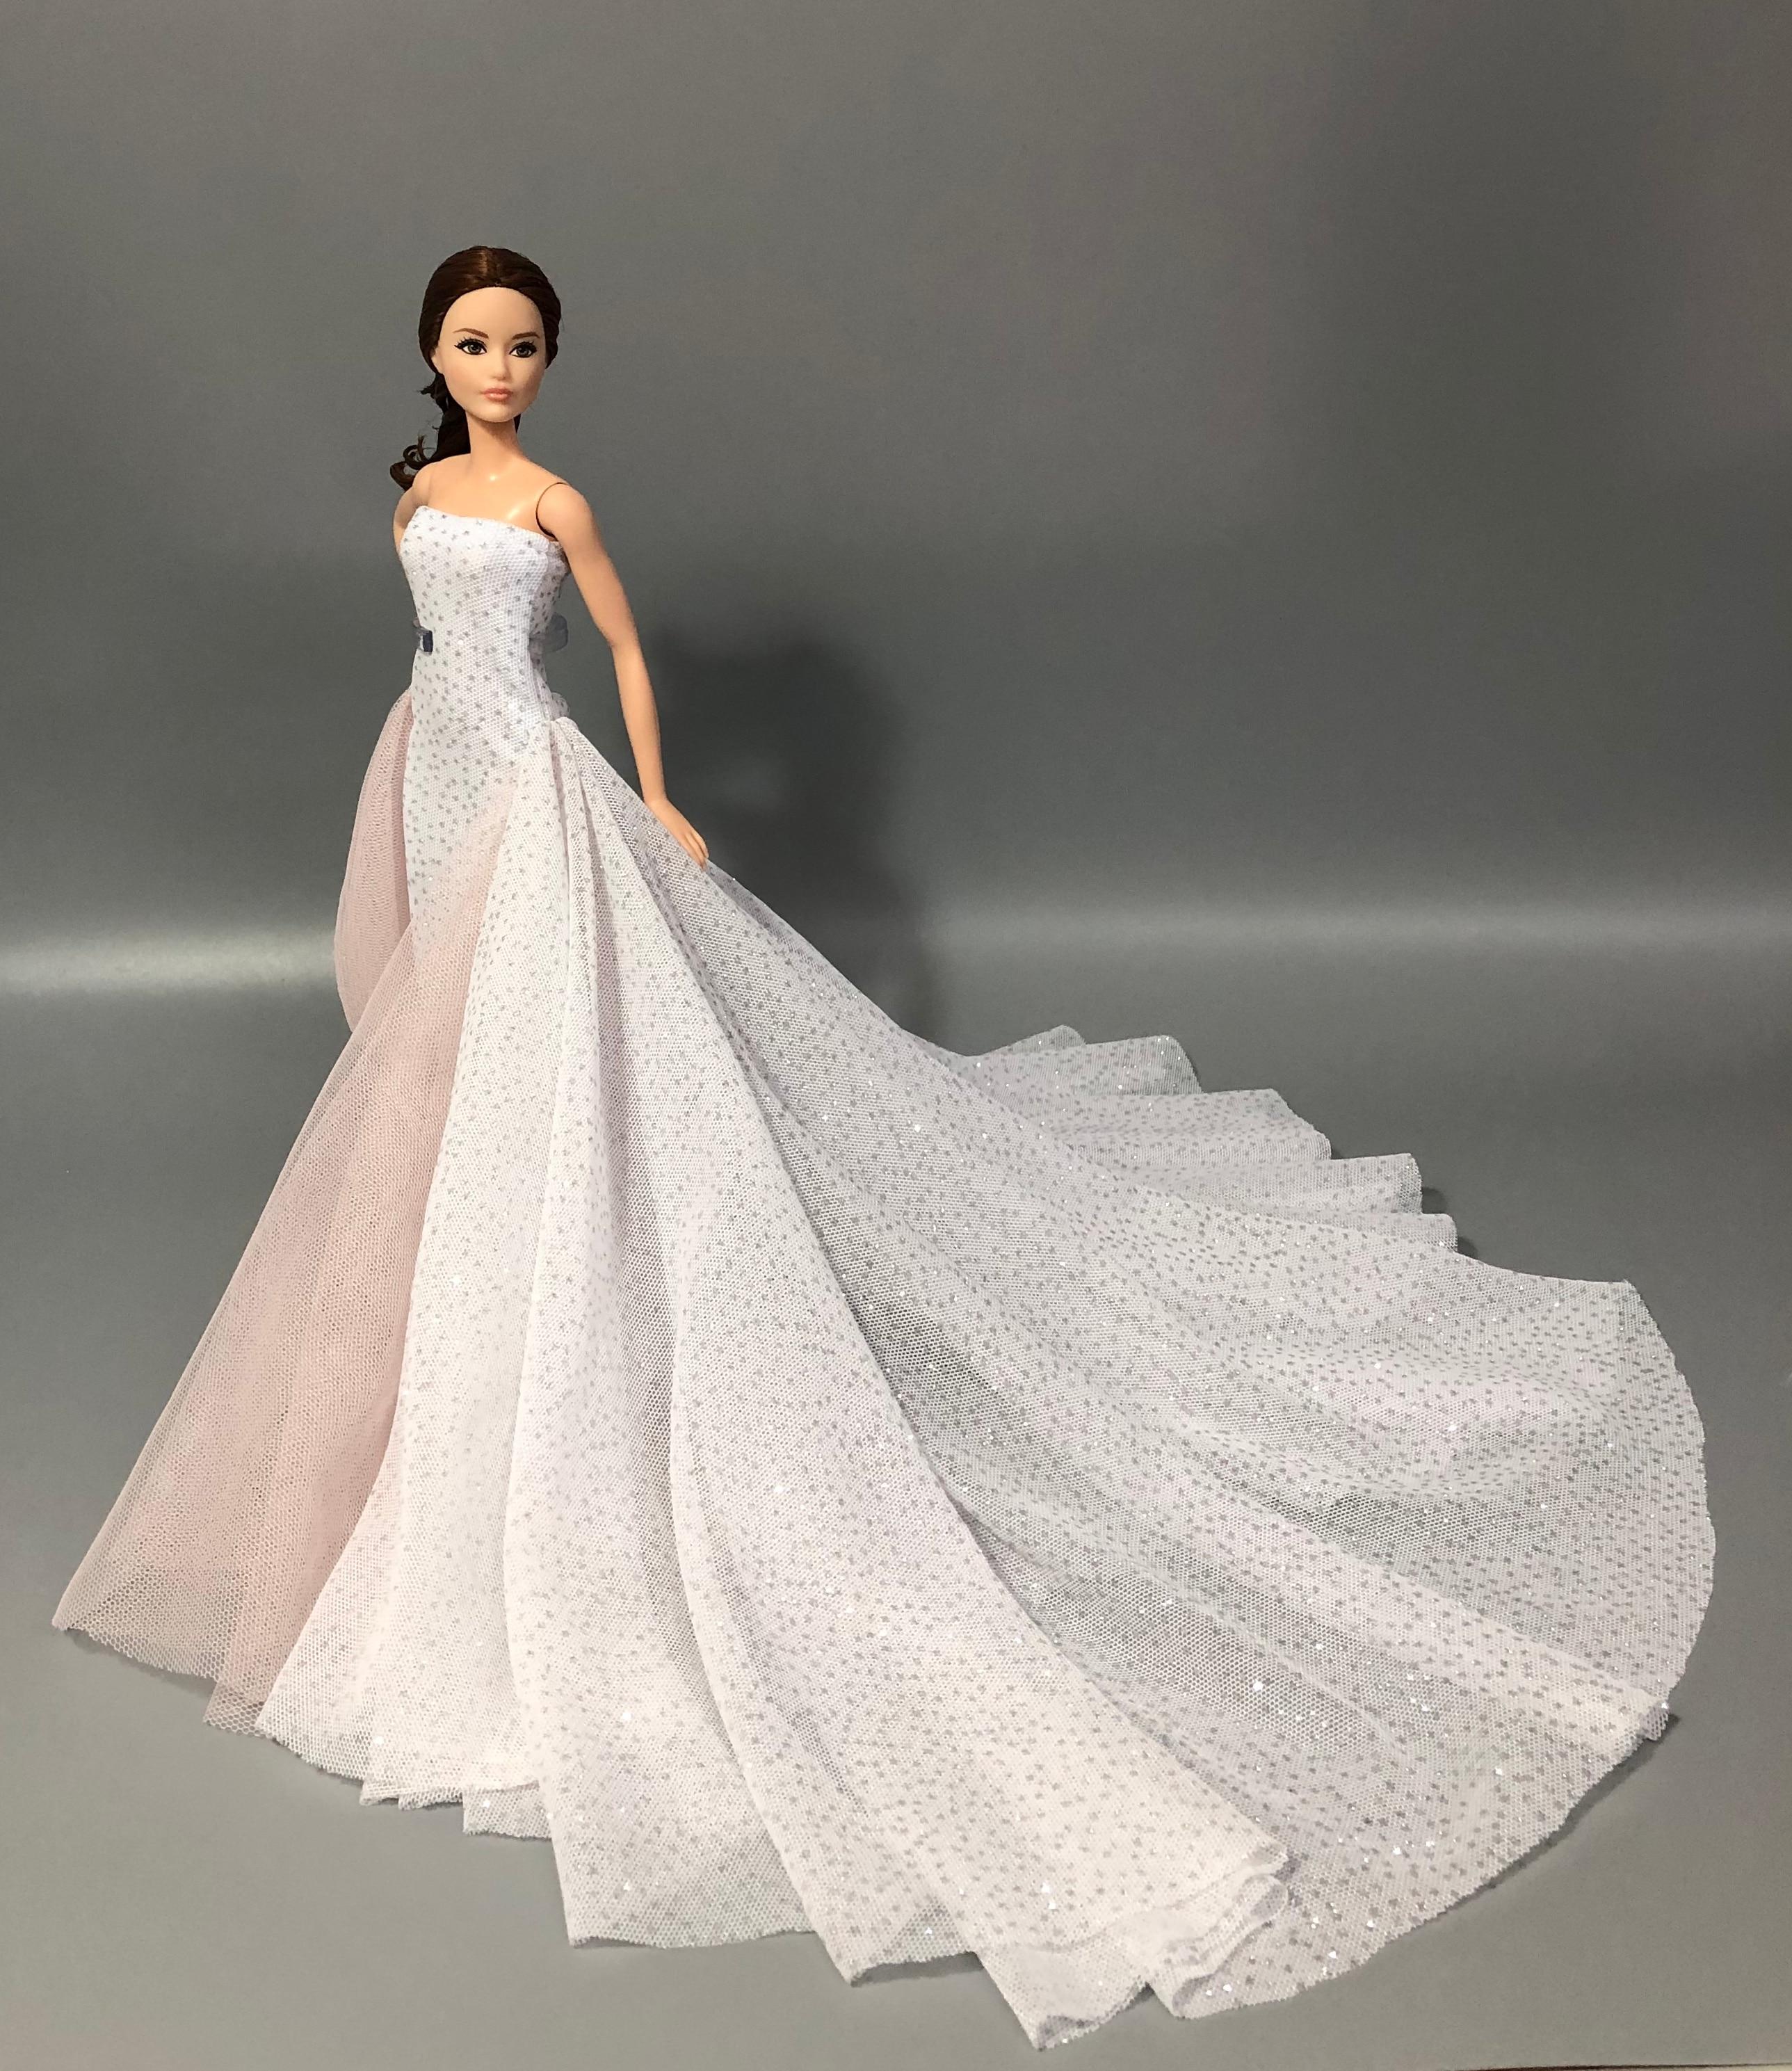 The Original For Barbie Dress Barbie Doll Clothes Wedding Dress Quality Goods Fashion Skirt Princess Dress Doll Accessories